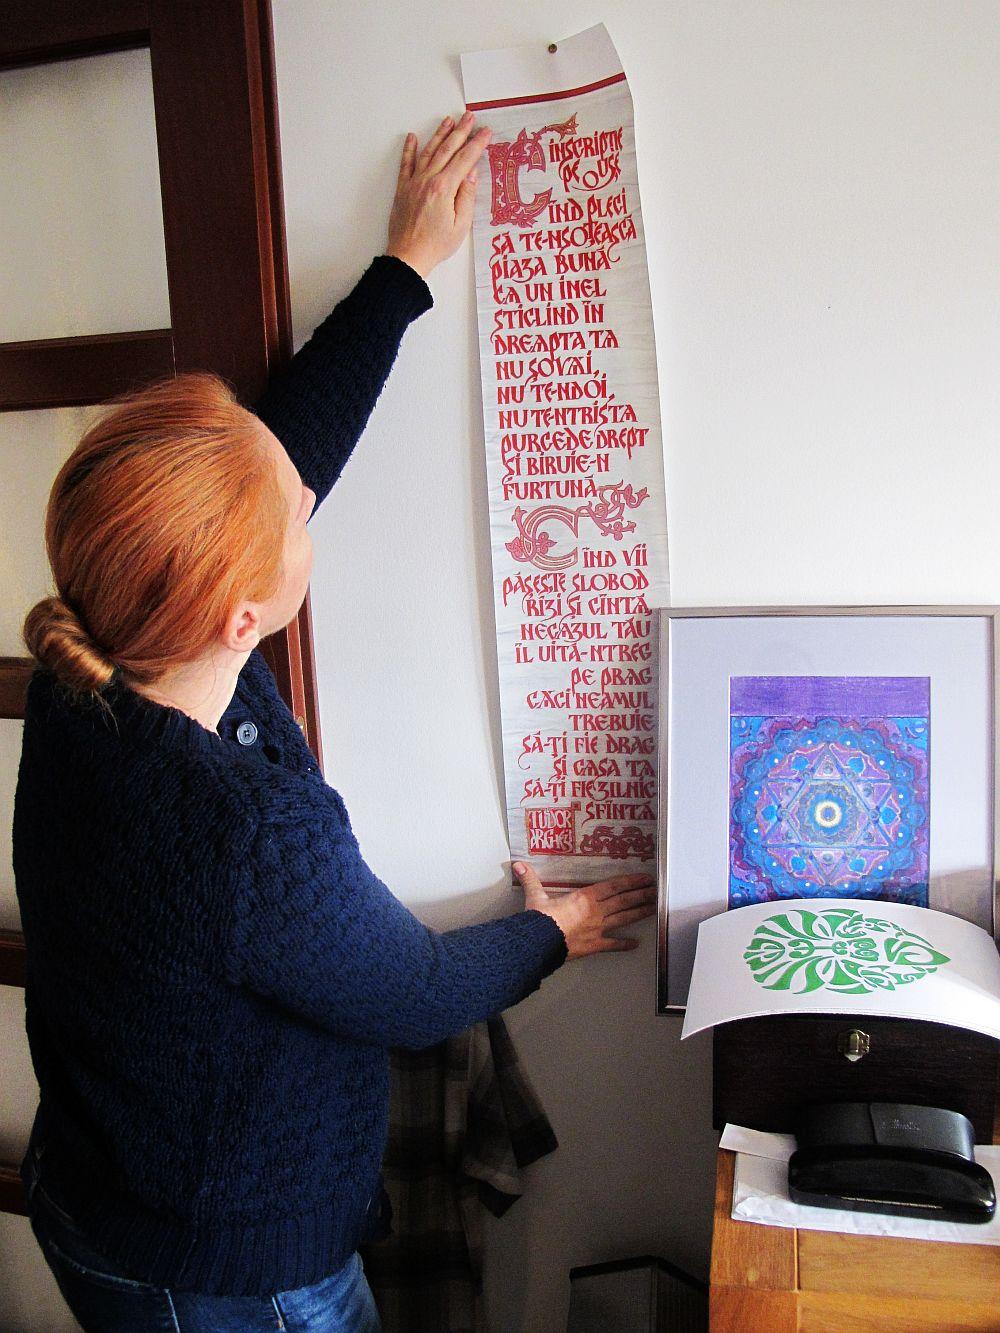 adelaparvu.com about Ioana Dominte artist (27)